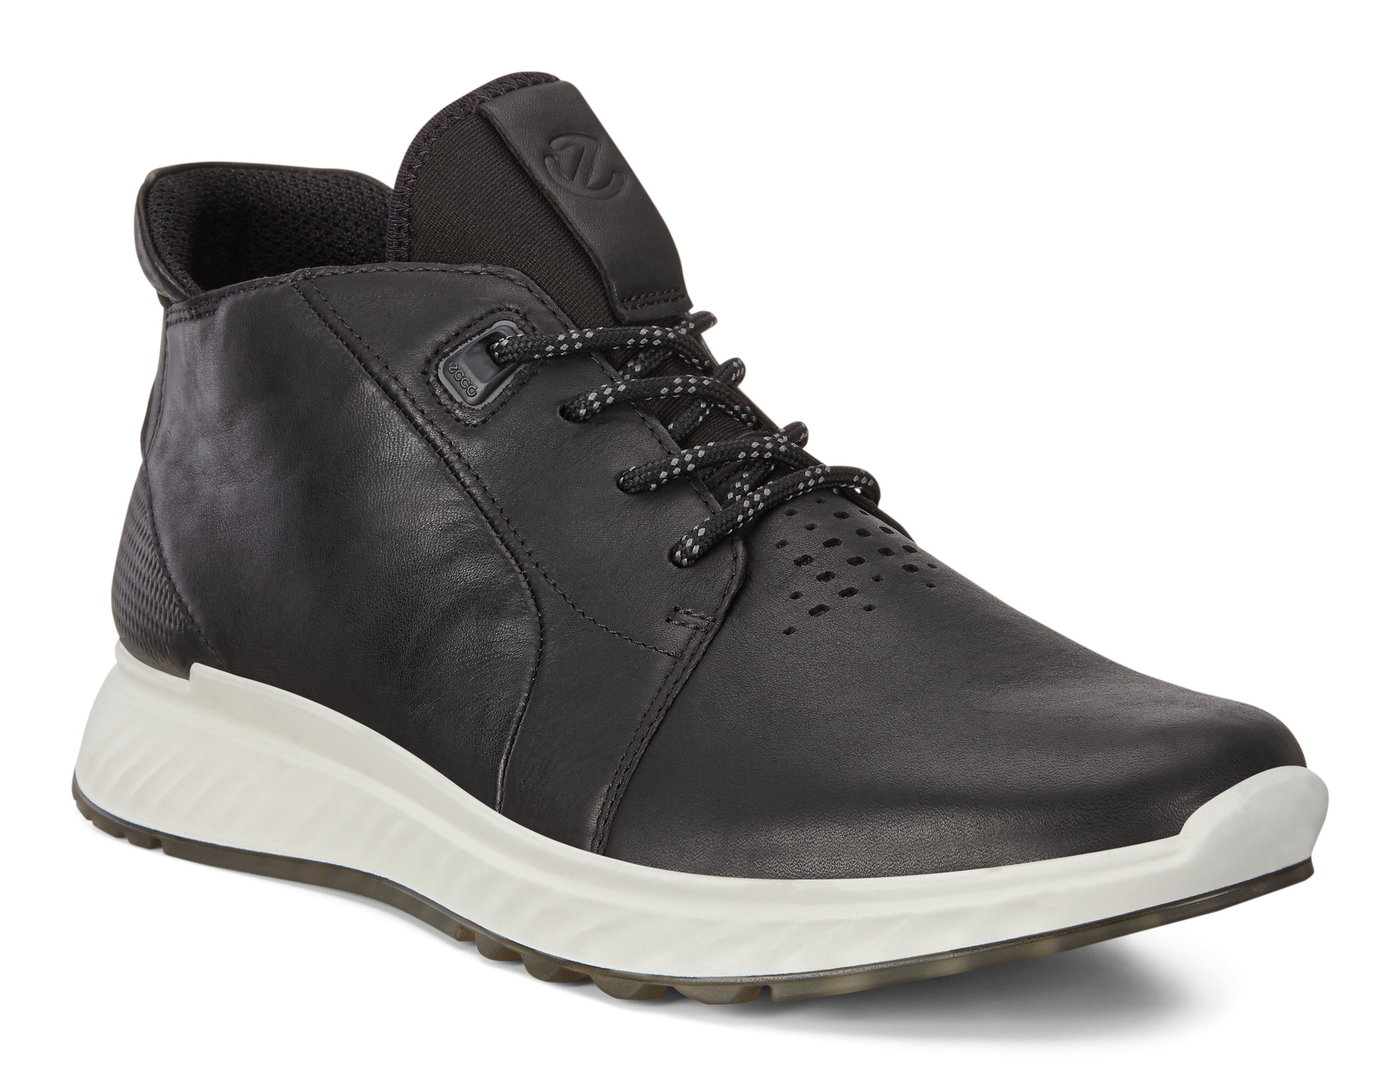 ECCO ST1 Mens High Cut Sneaker Lace